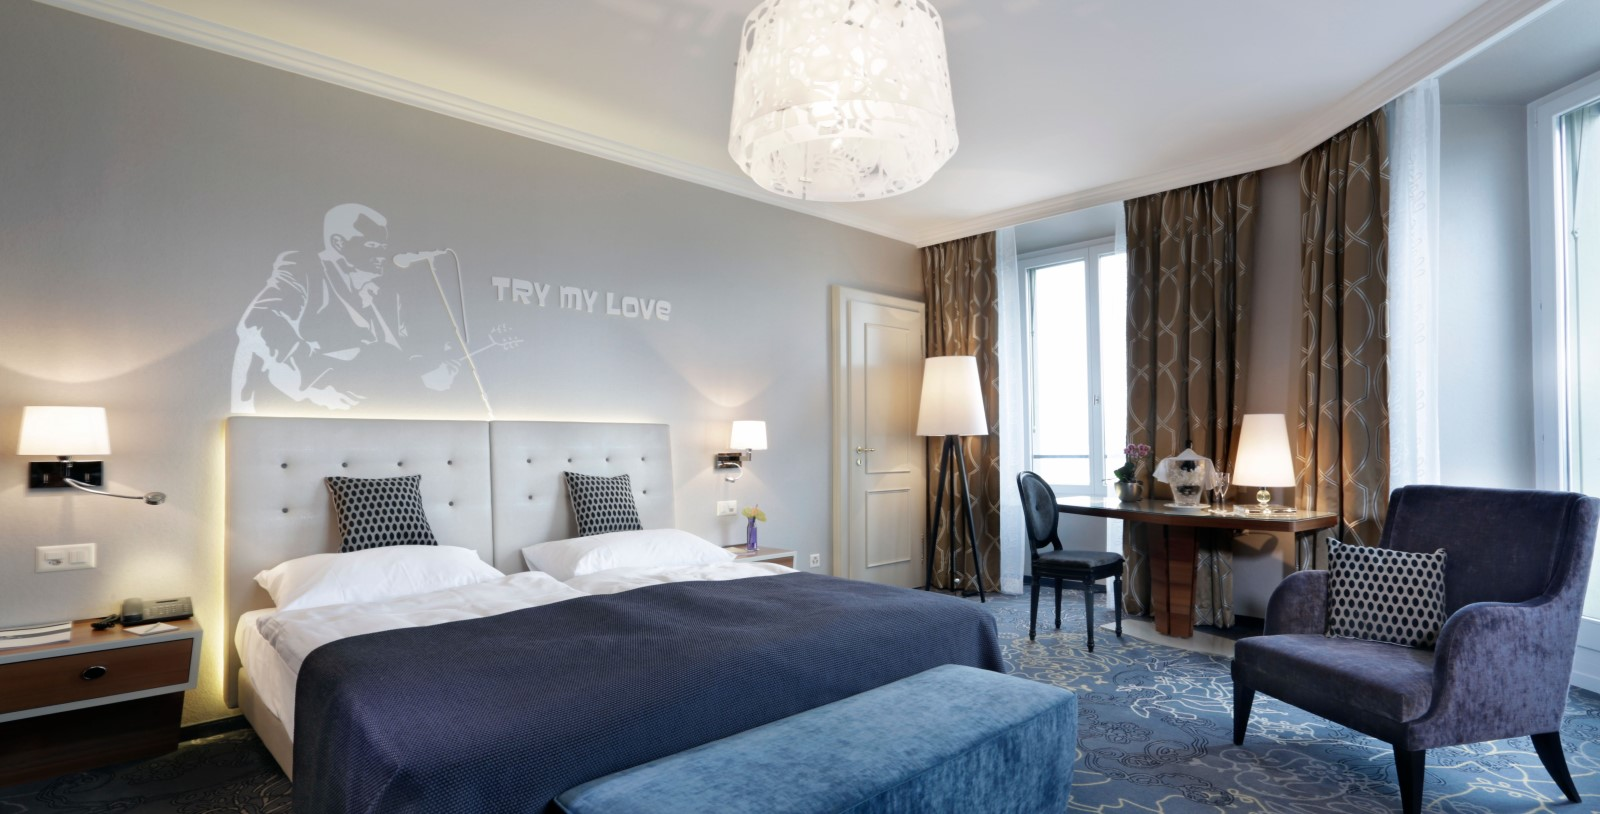 Image of Guestroom Interior, Hotel Schweizerhof Luzern, Switzerland, 1845, Member of Historic Hotels Worldwide, Accommodations